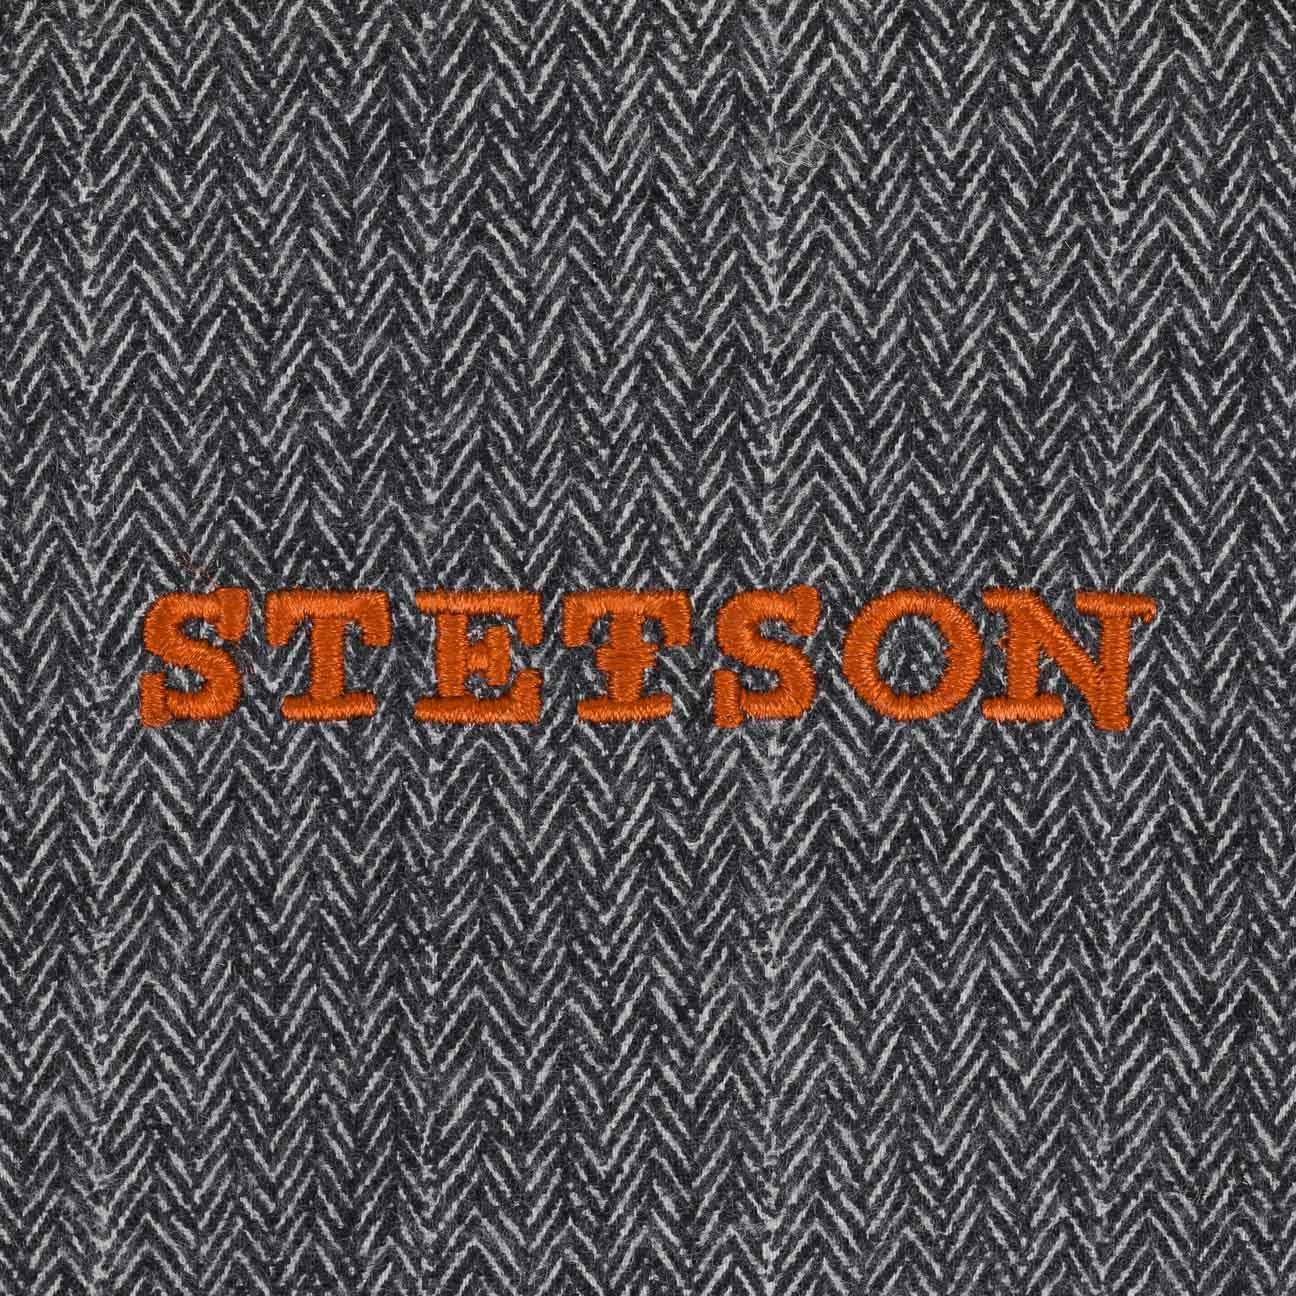 Lining Summer-Winter Flat caps Newsboy with Peak Stetson Hatteras Pigskin Leather Cap Men